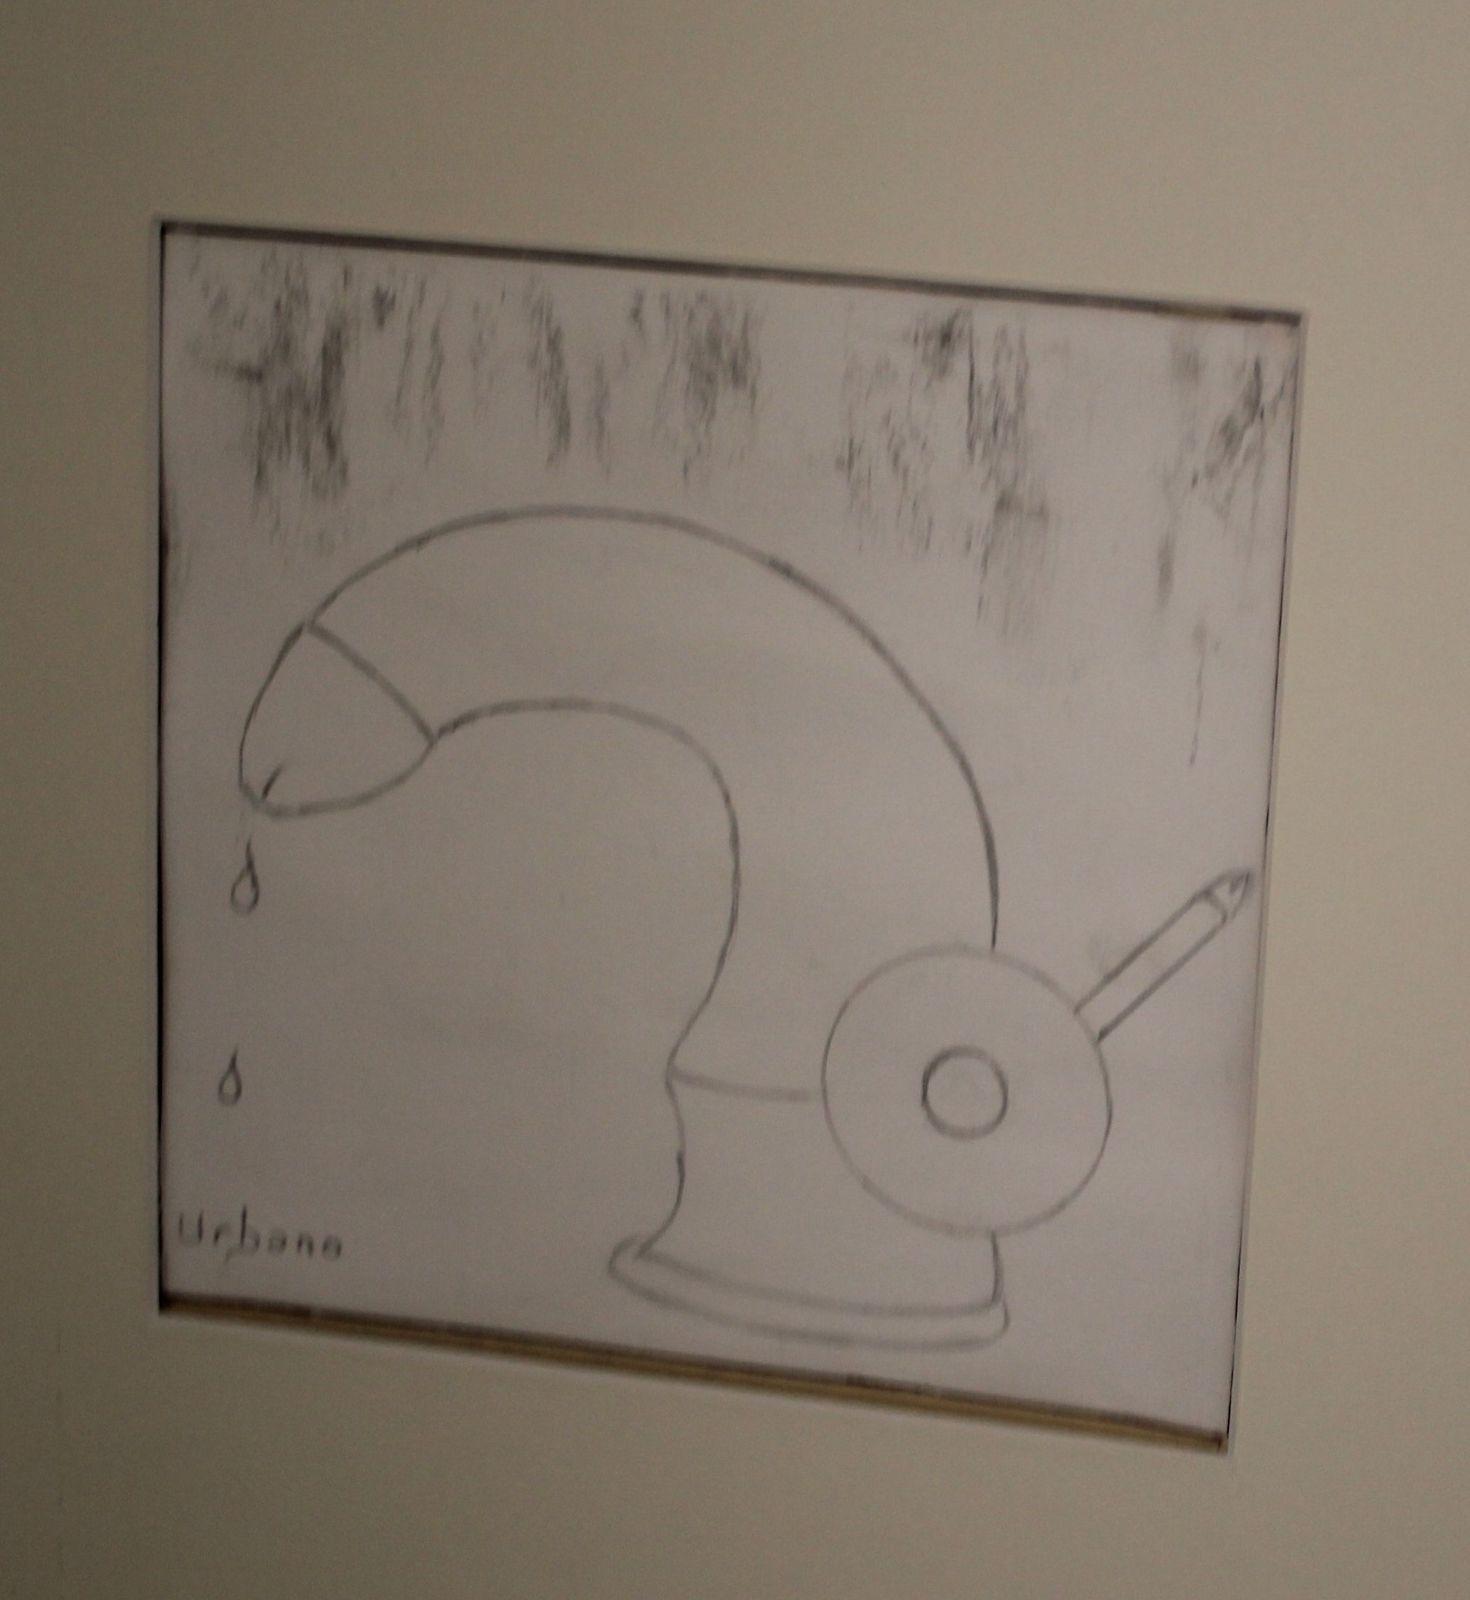 Robert URBANO www.artiste-peintre-68.webself.net